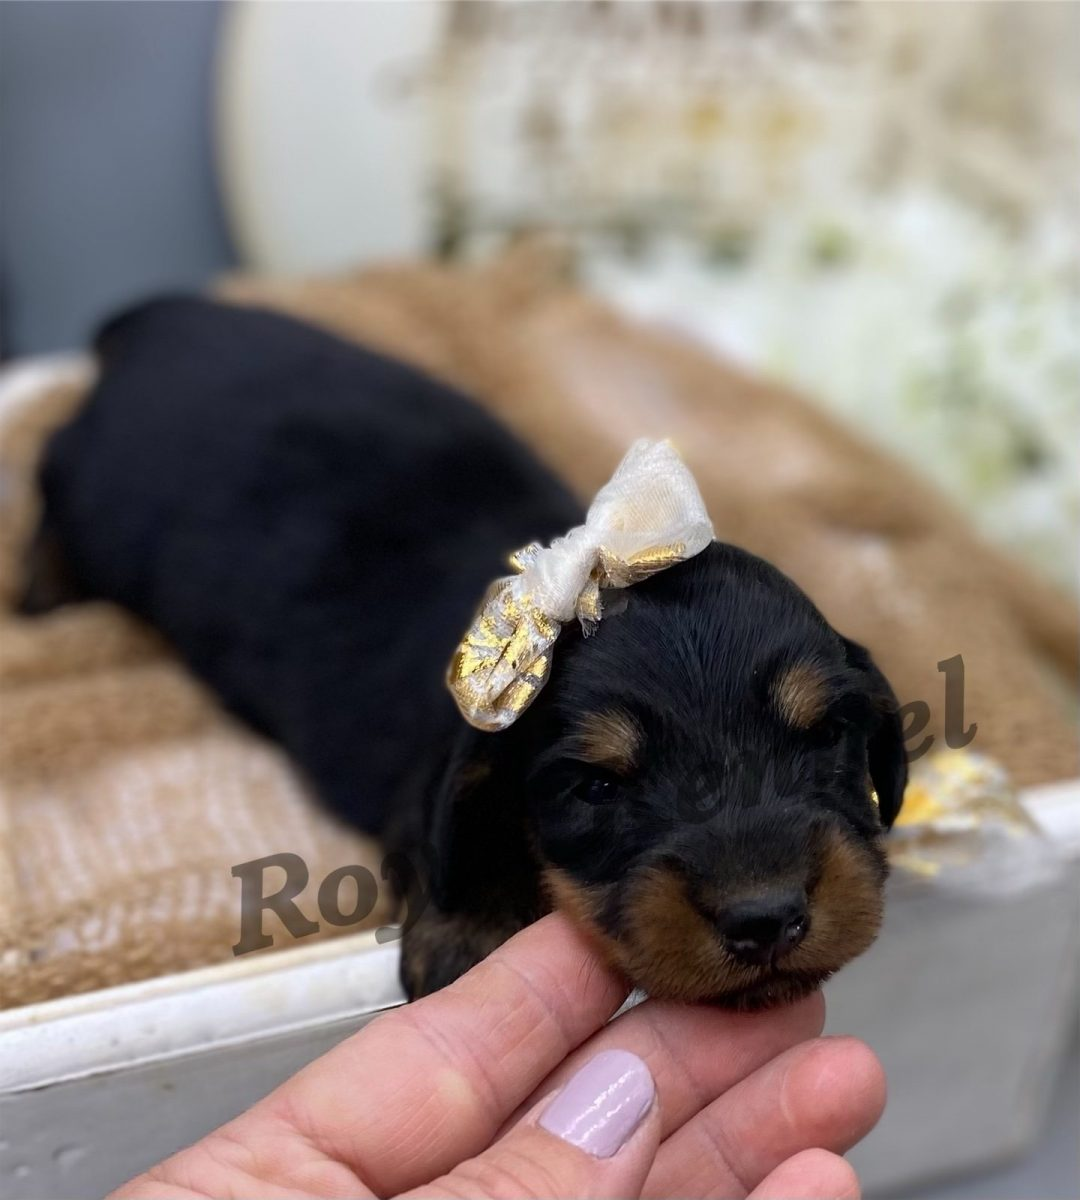 Lucy - AKC Miniature Dachshund pupper for sale near West Plains, Missouri